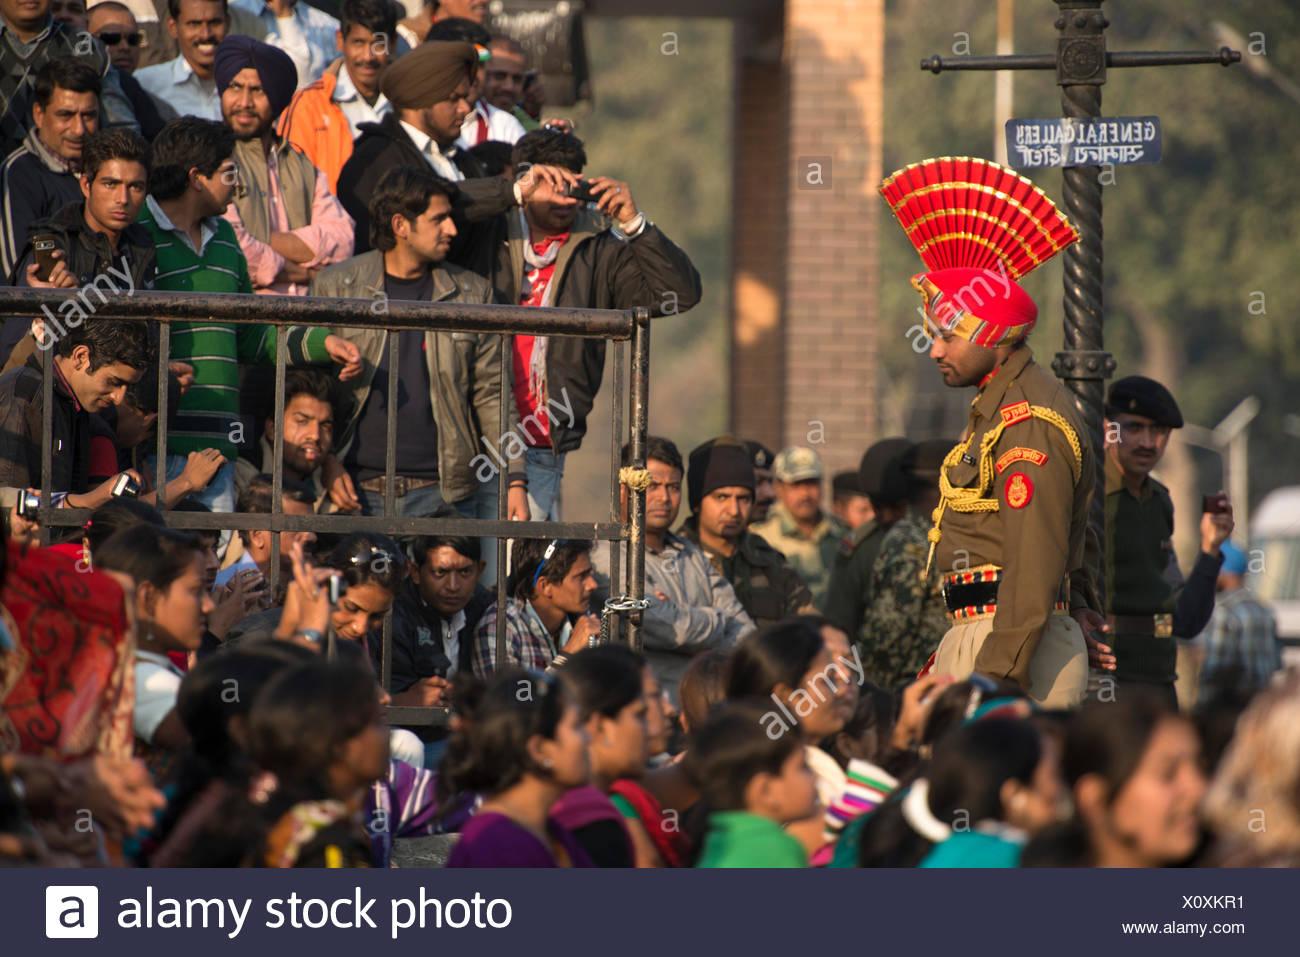 Asia, India, Punjab, Amritsar, Pakistani, border, ceremony, traditional, tradition, Wagah, soldier, crowd, nationalism, Indian, - Stock Image